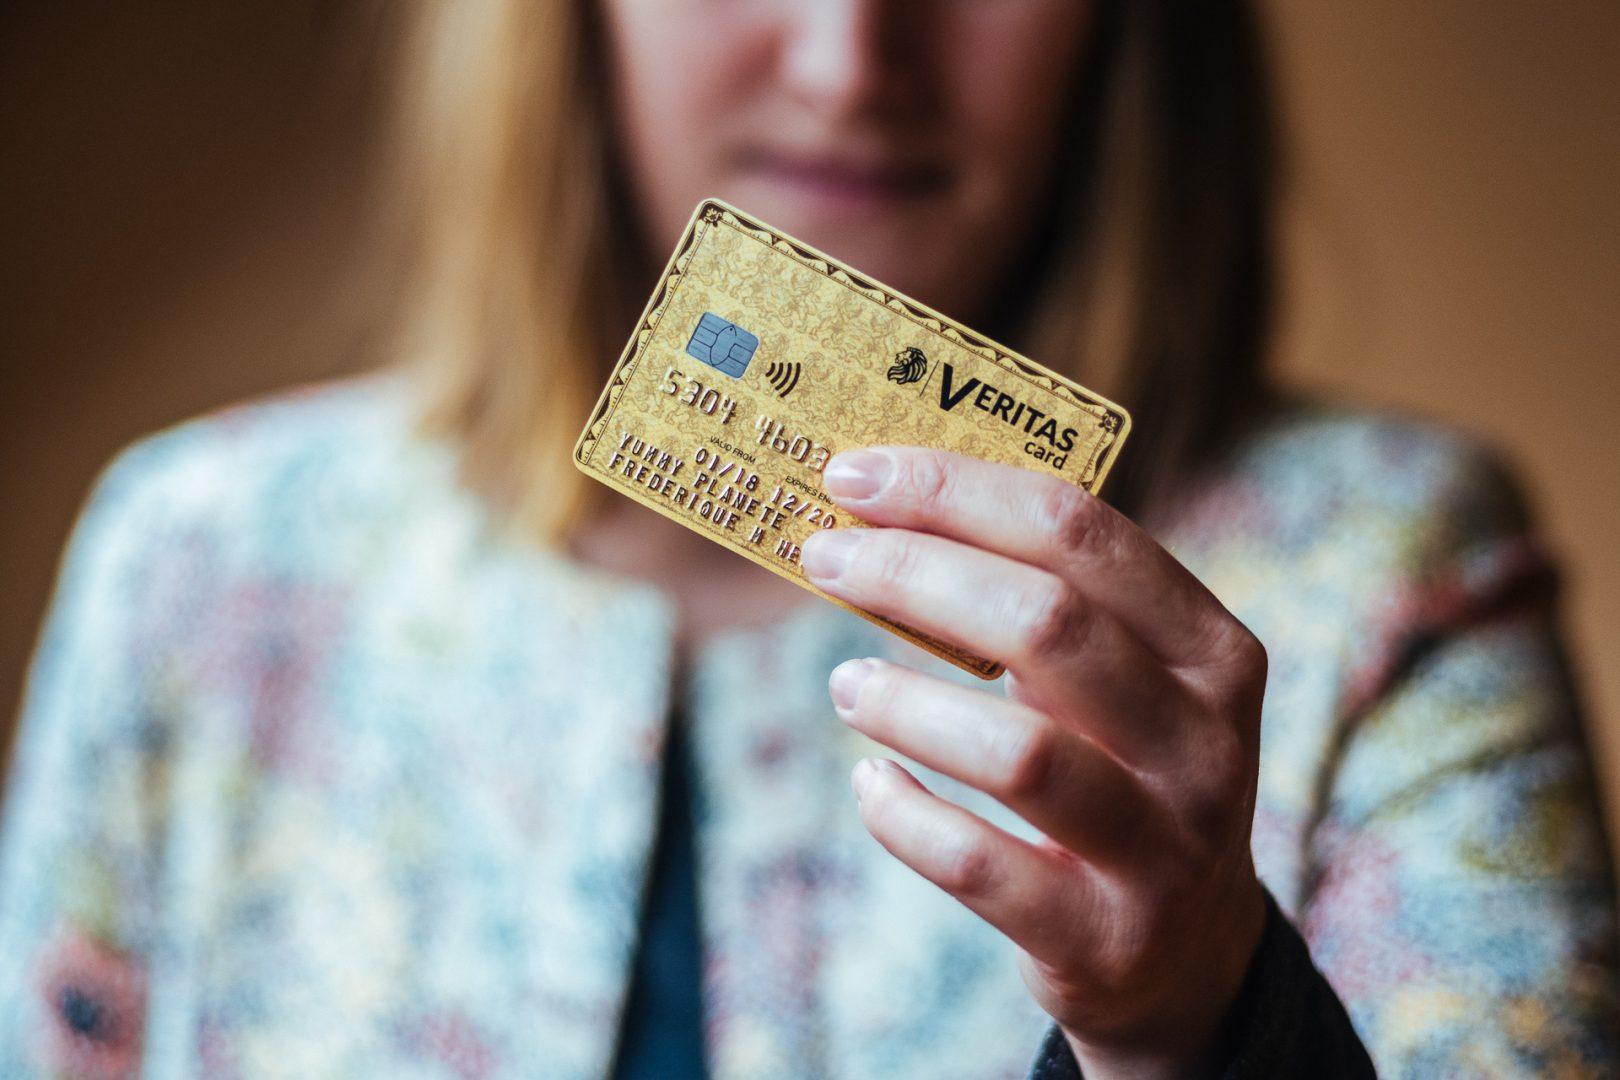 Veritas Card la carte bancaire prepayee avec RIB